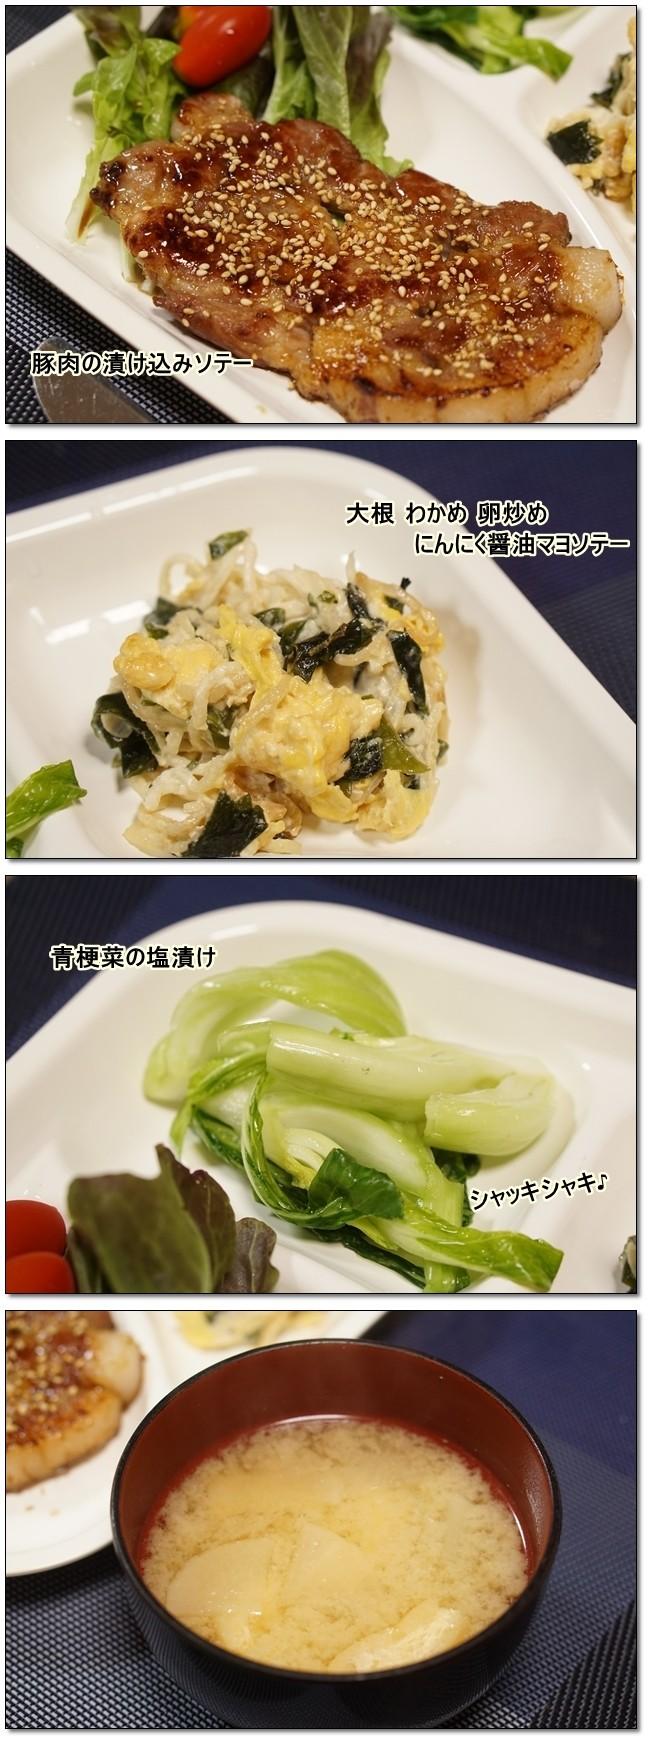 ■DSC03888-vert